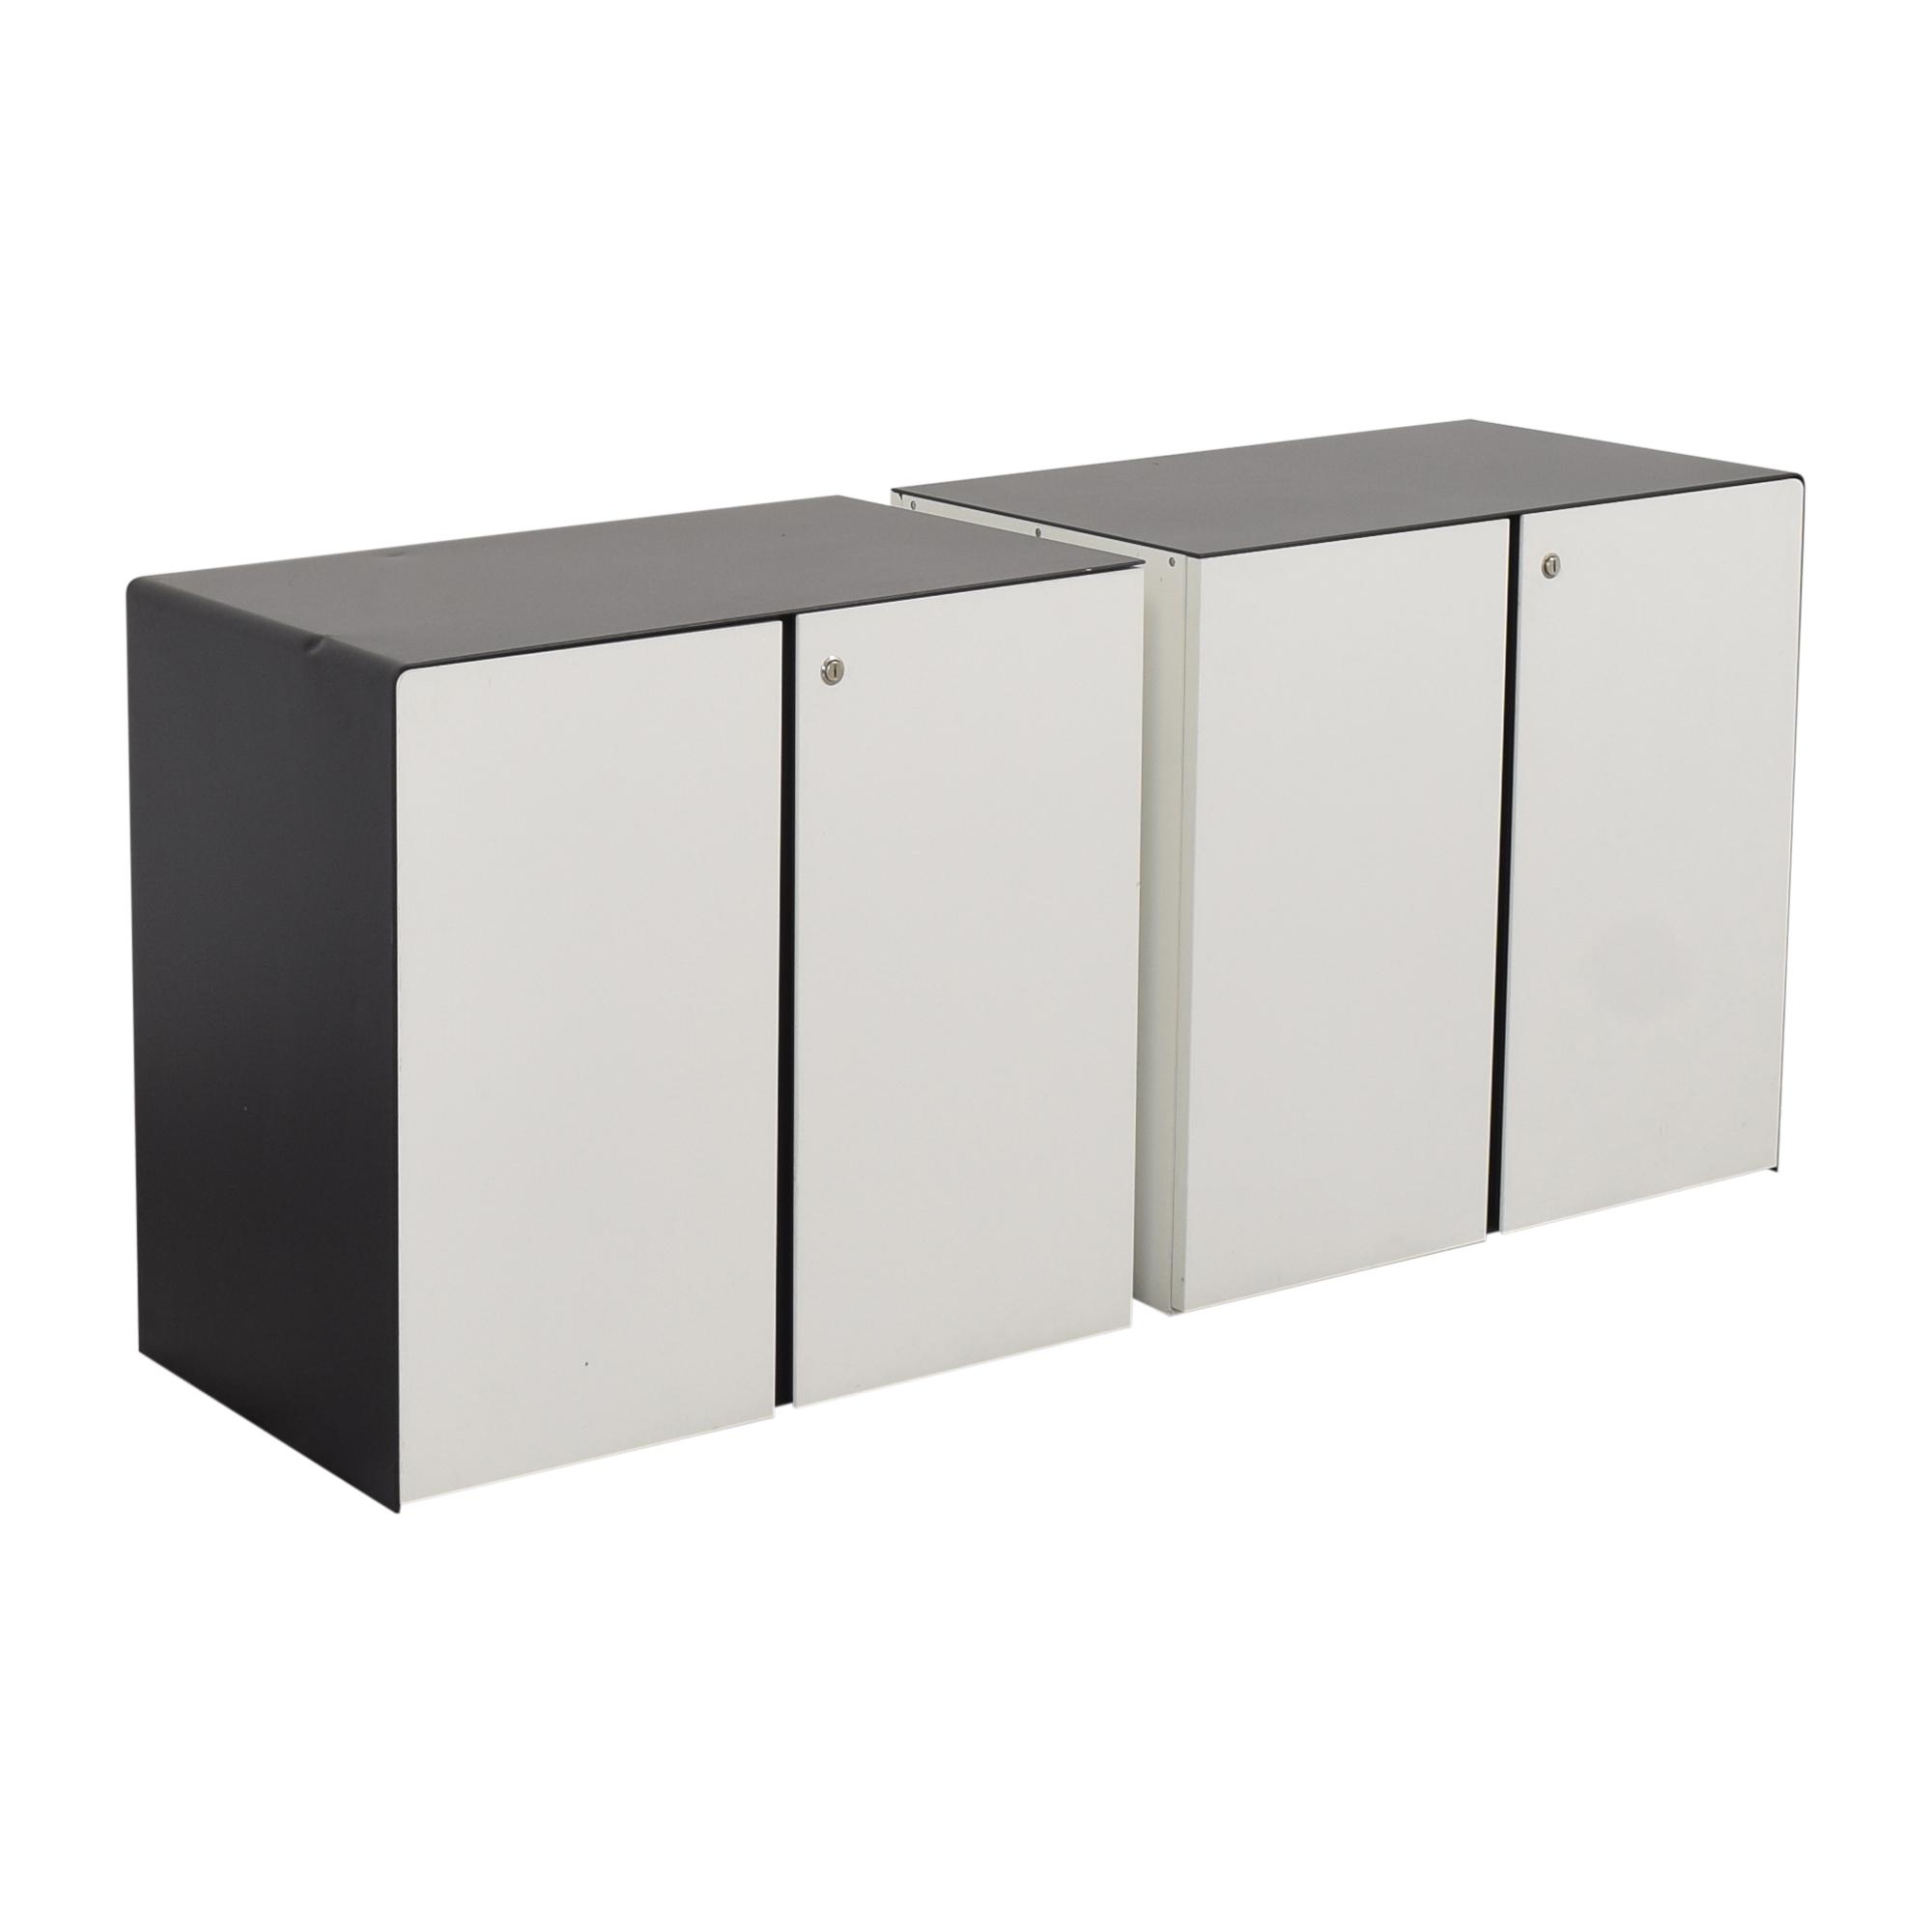 Koleksiyon Koleksiyon Song S2 Small Storage Cabinets ct